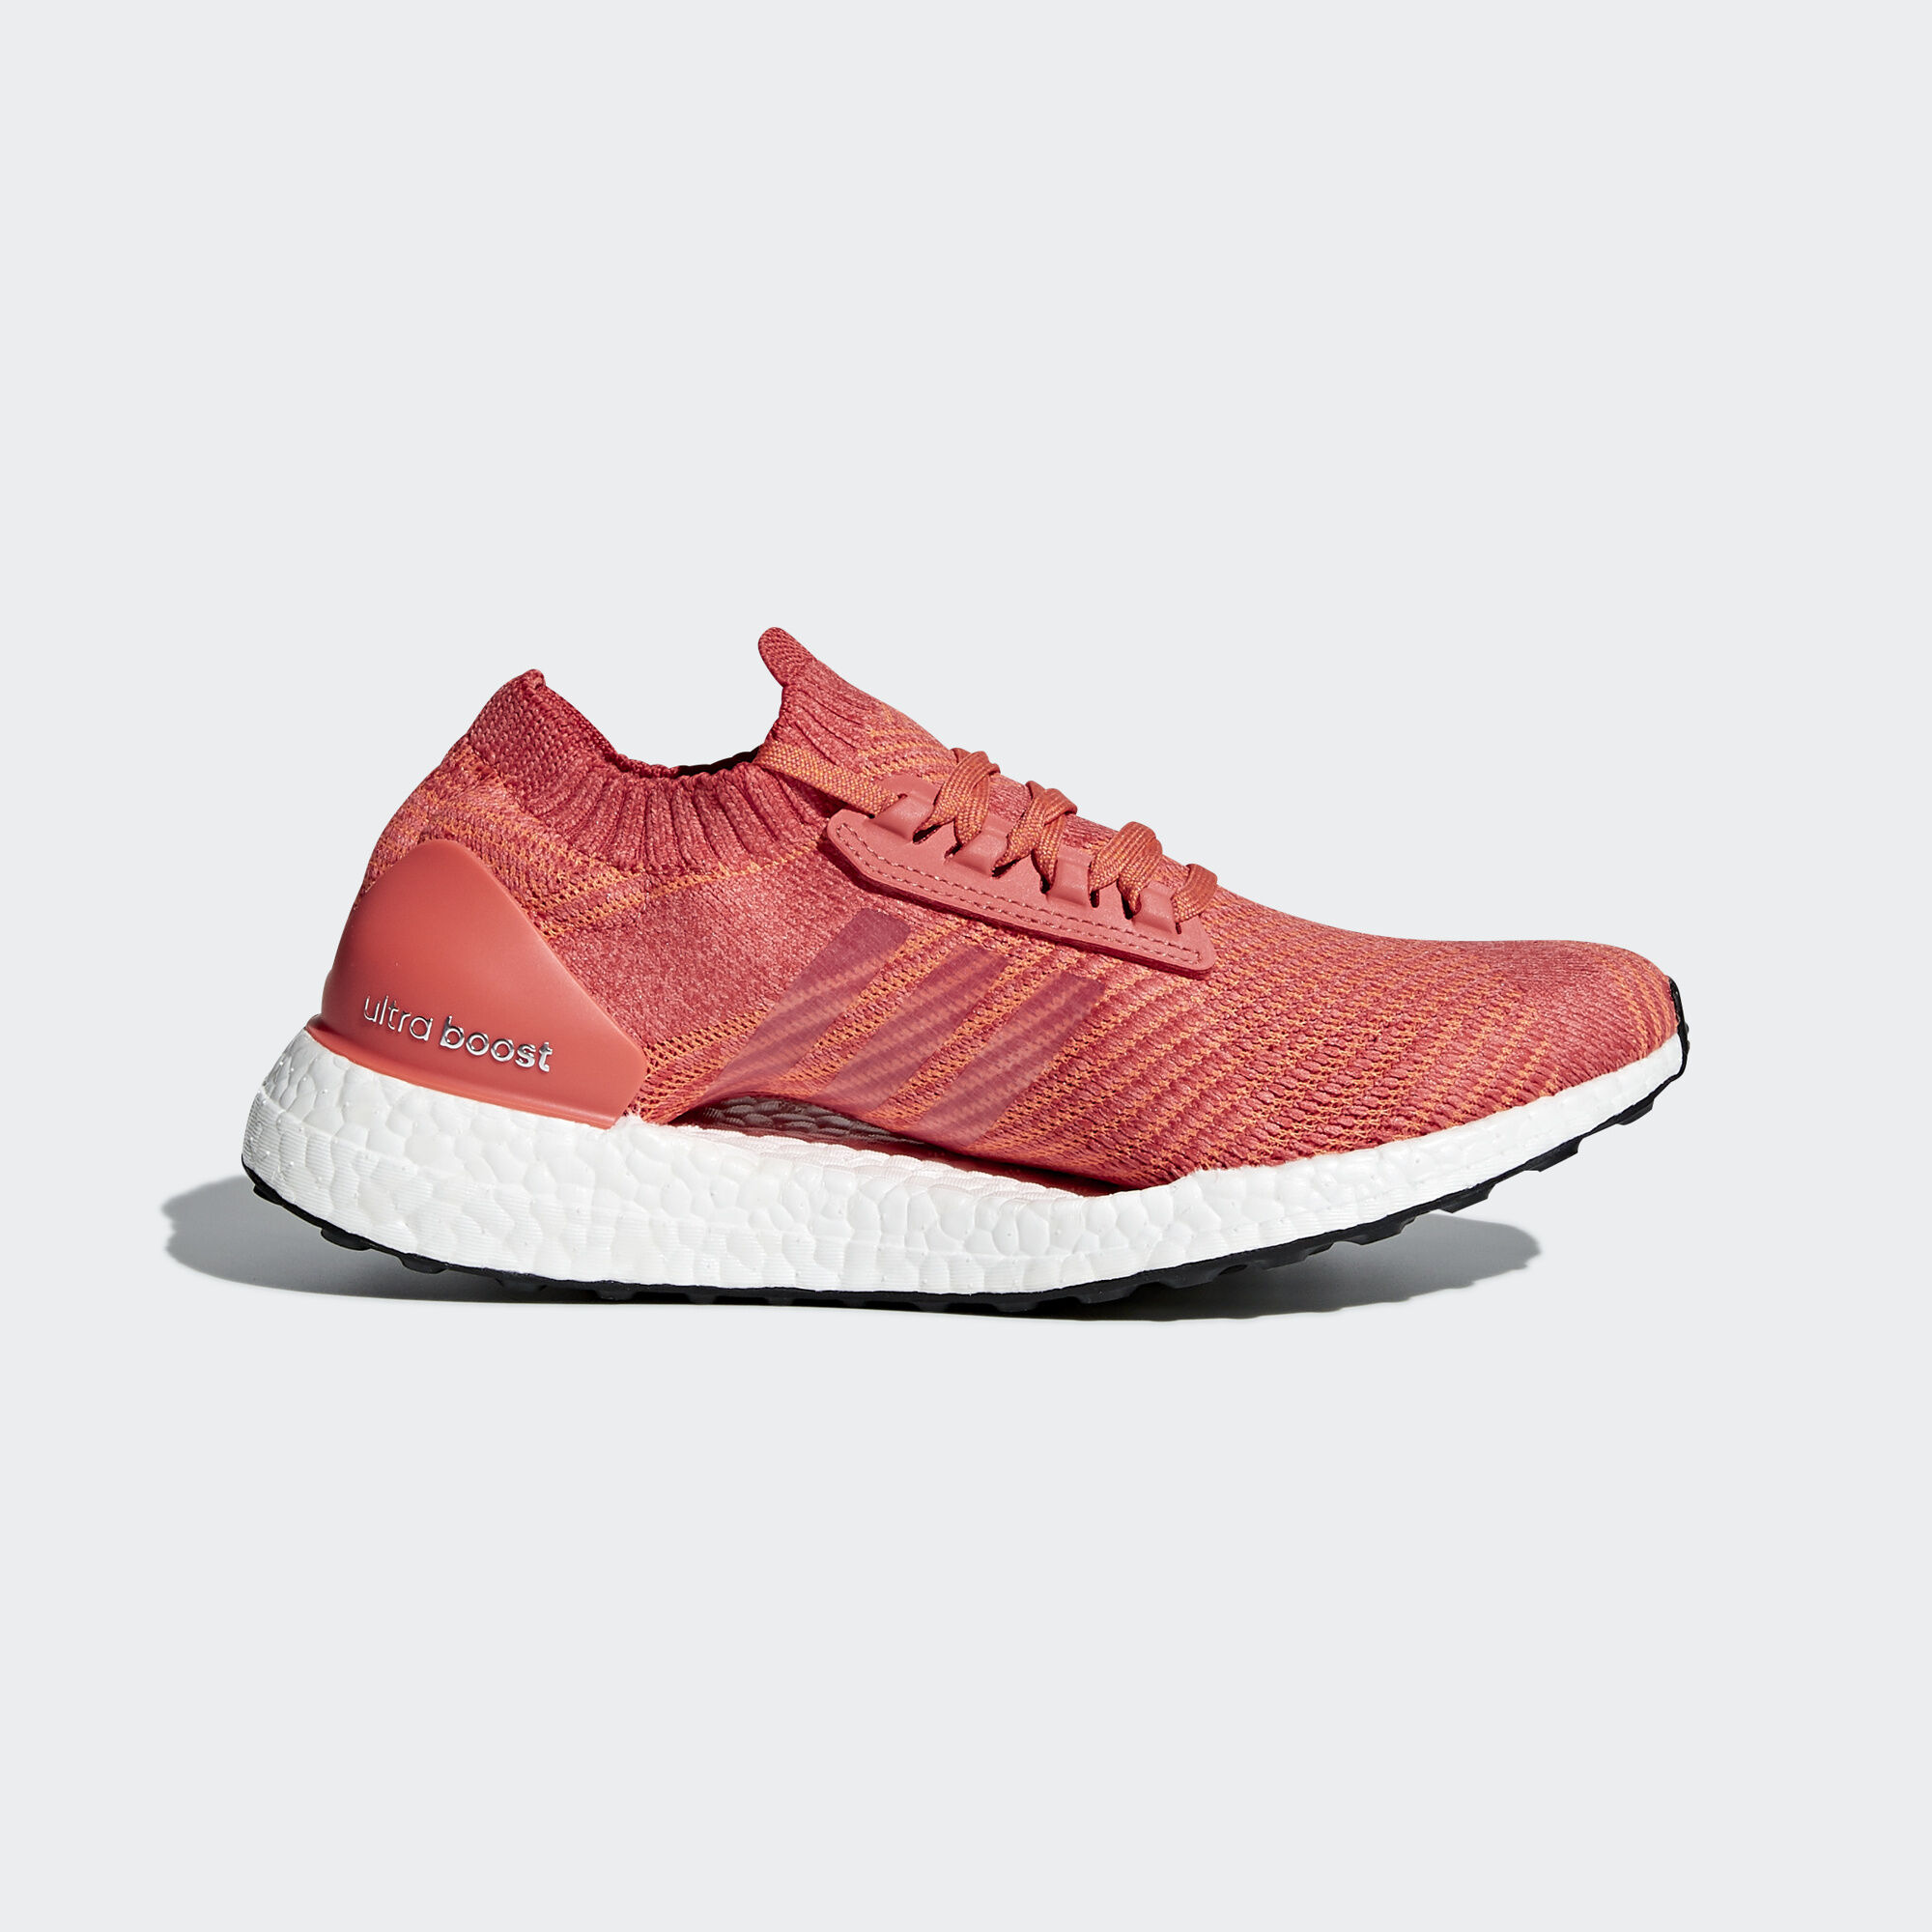 Adidas ultraboost x scarpe rosso adidas asia / medio oriente